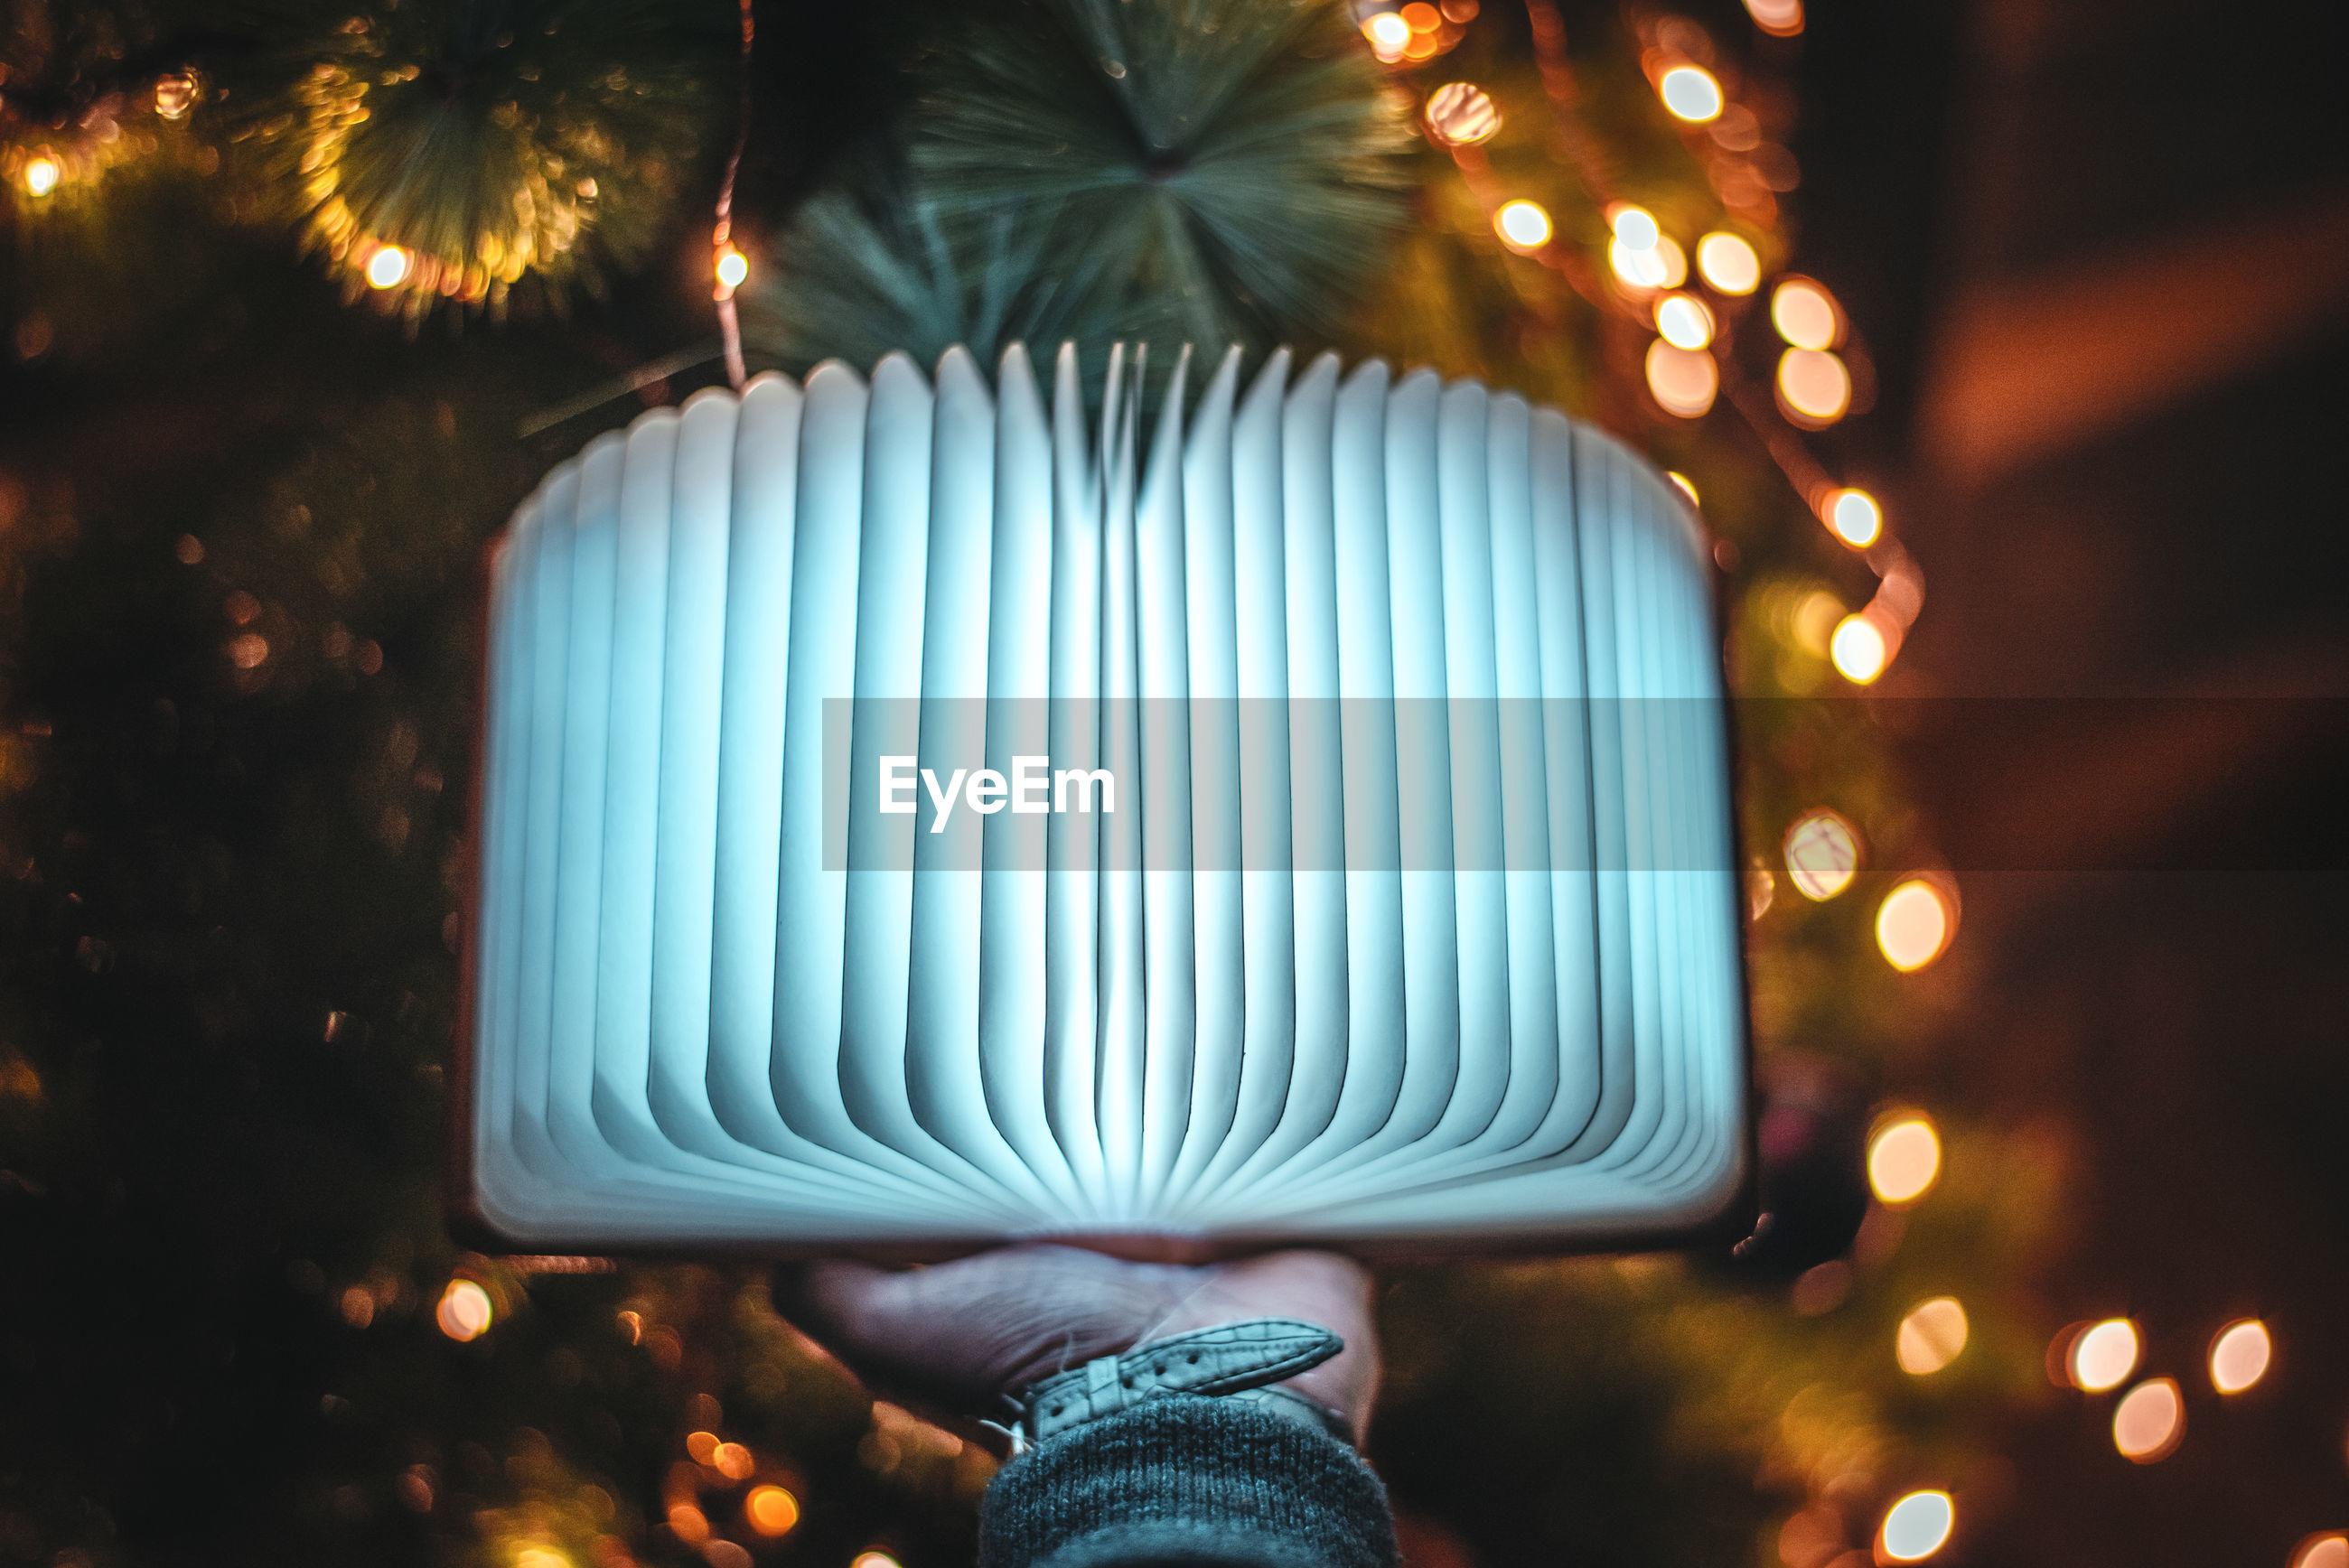 Close-up of hand holding illuminated lighting equipment at night